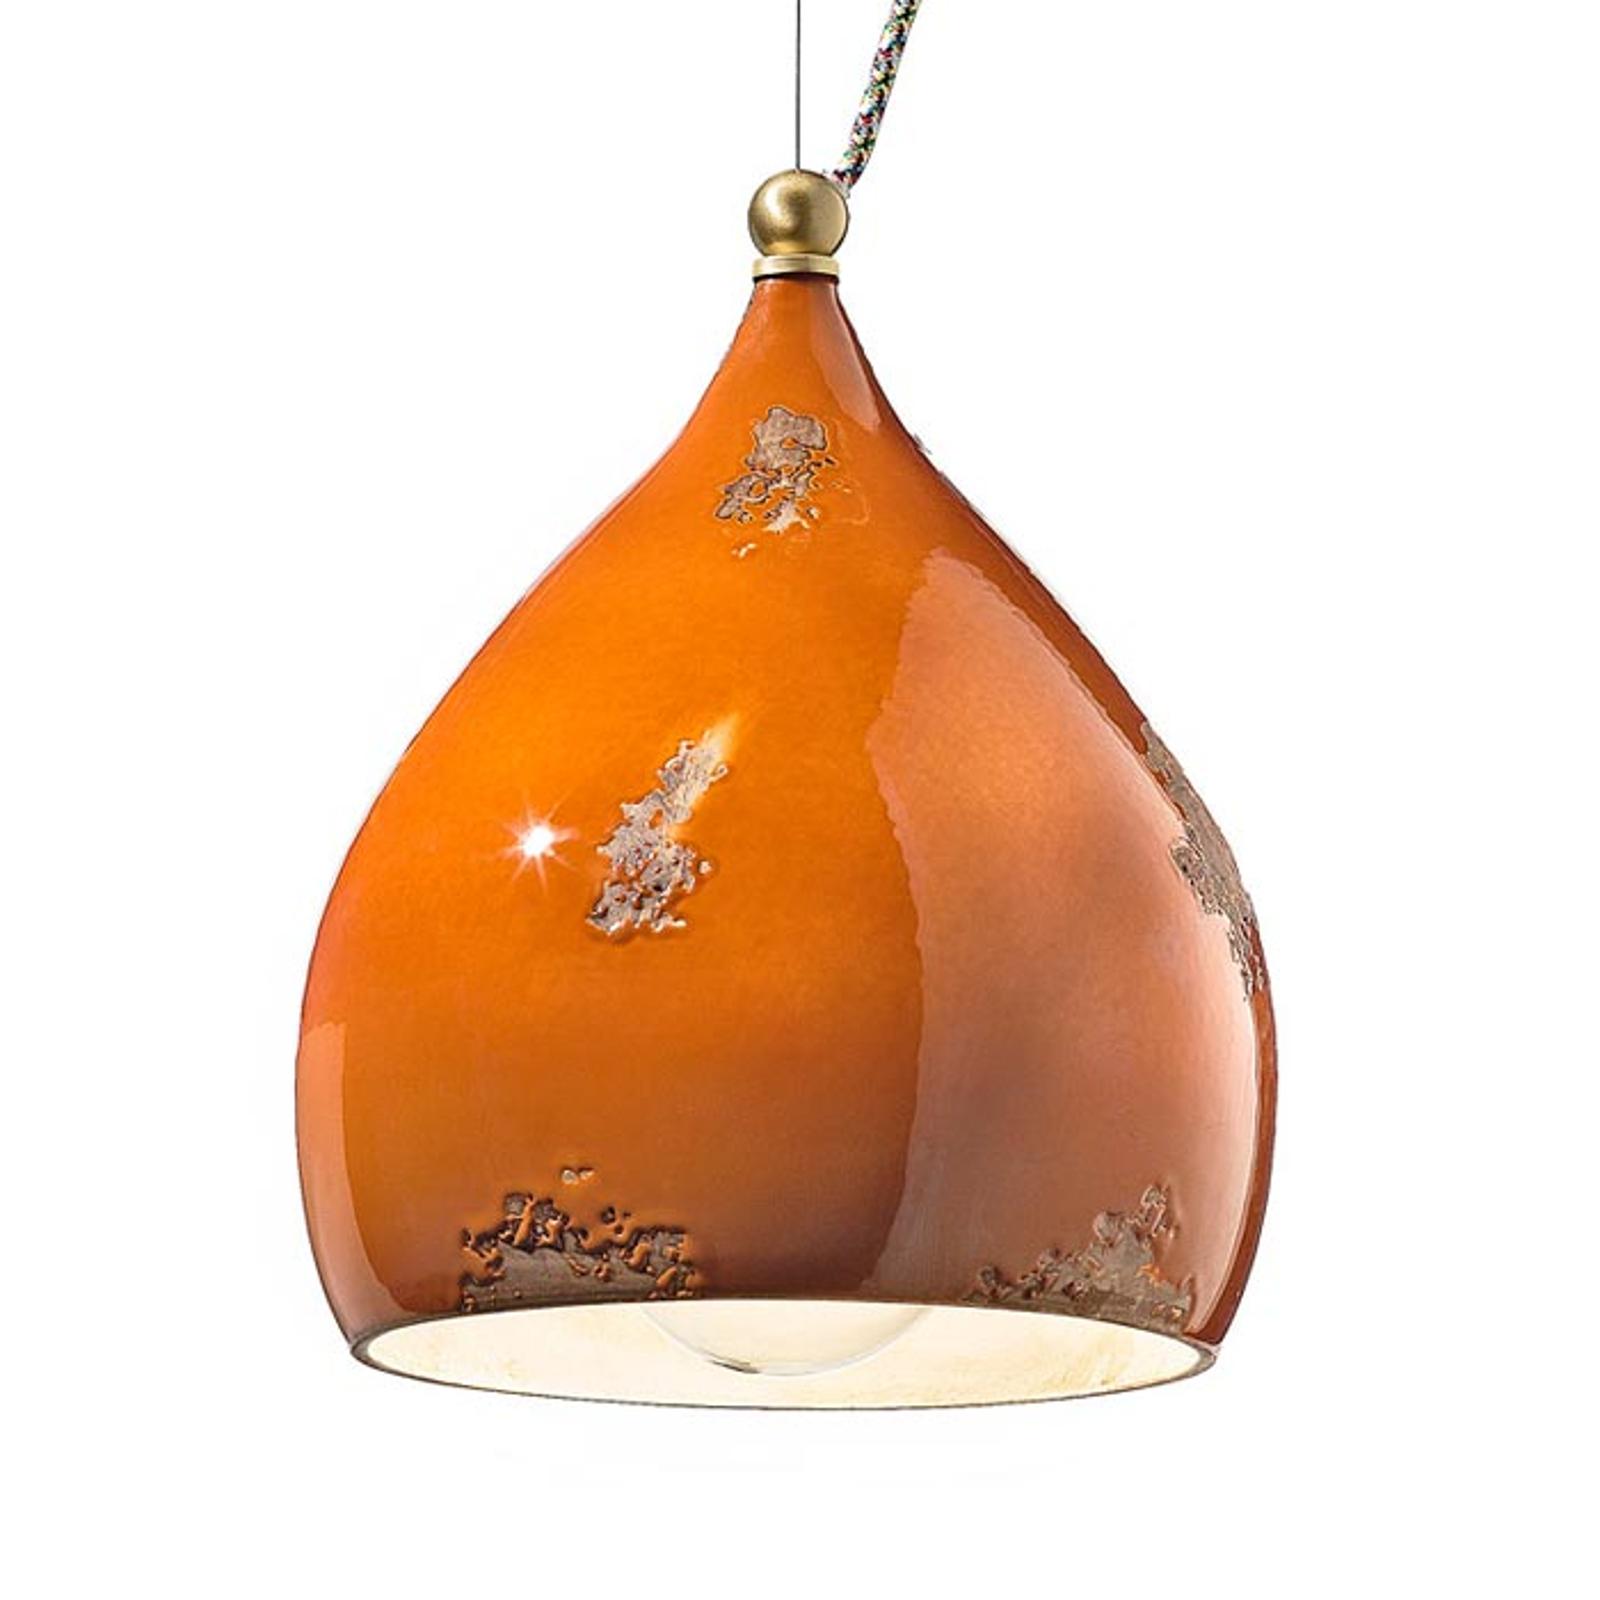 Závěsné světlo Federico z keramiky, oranžové